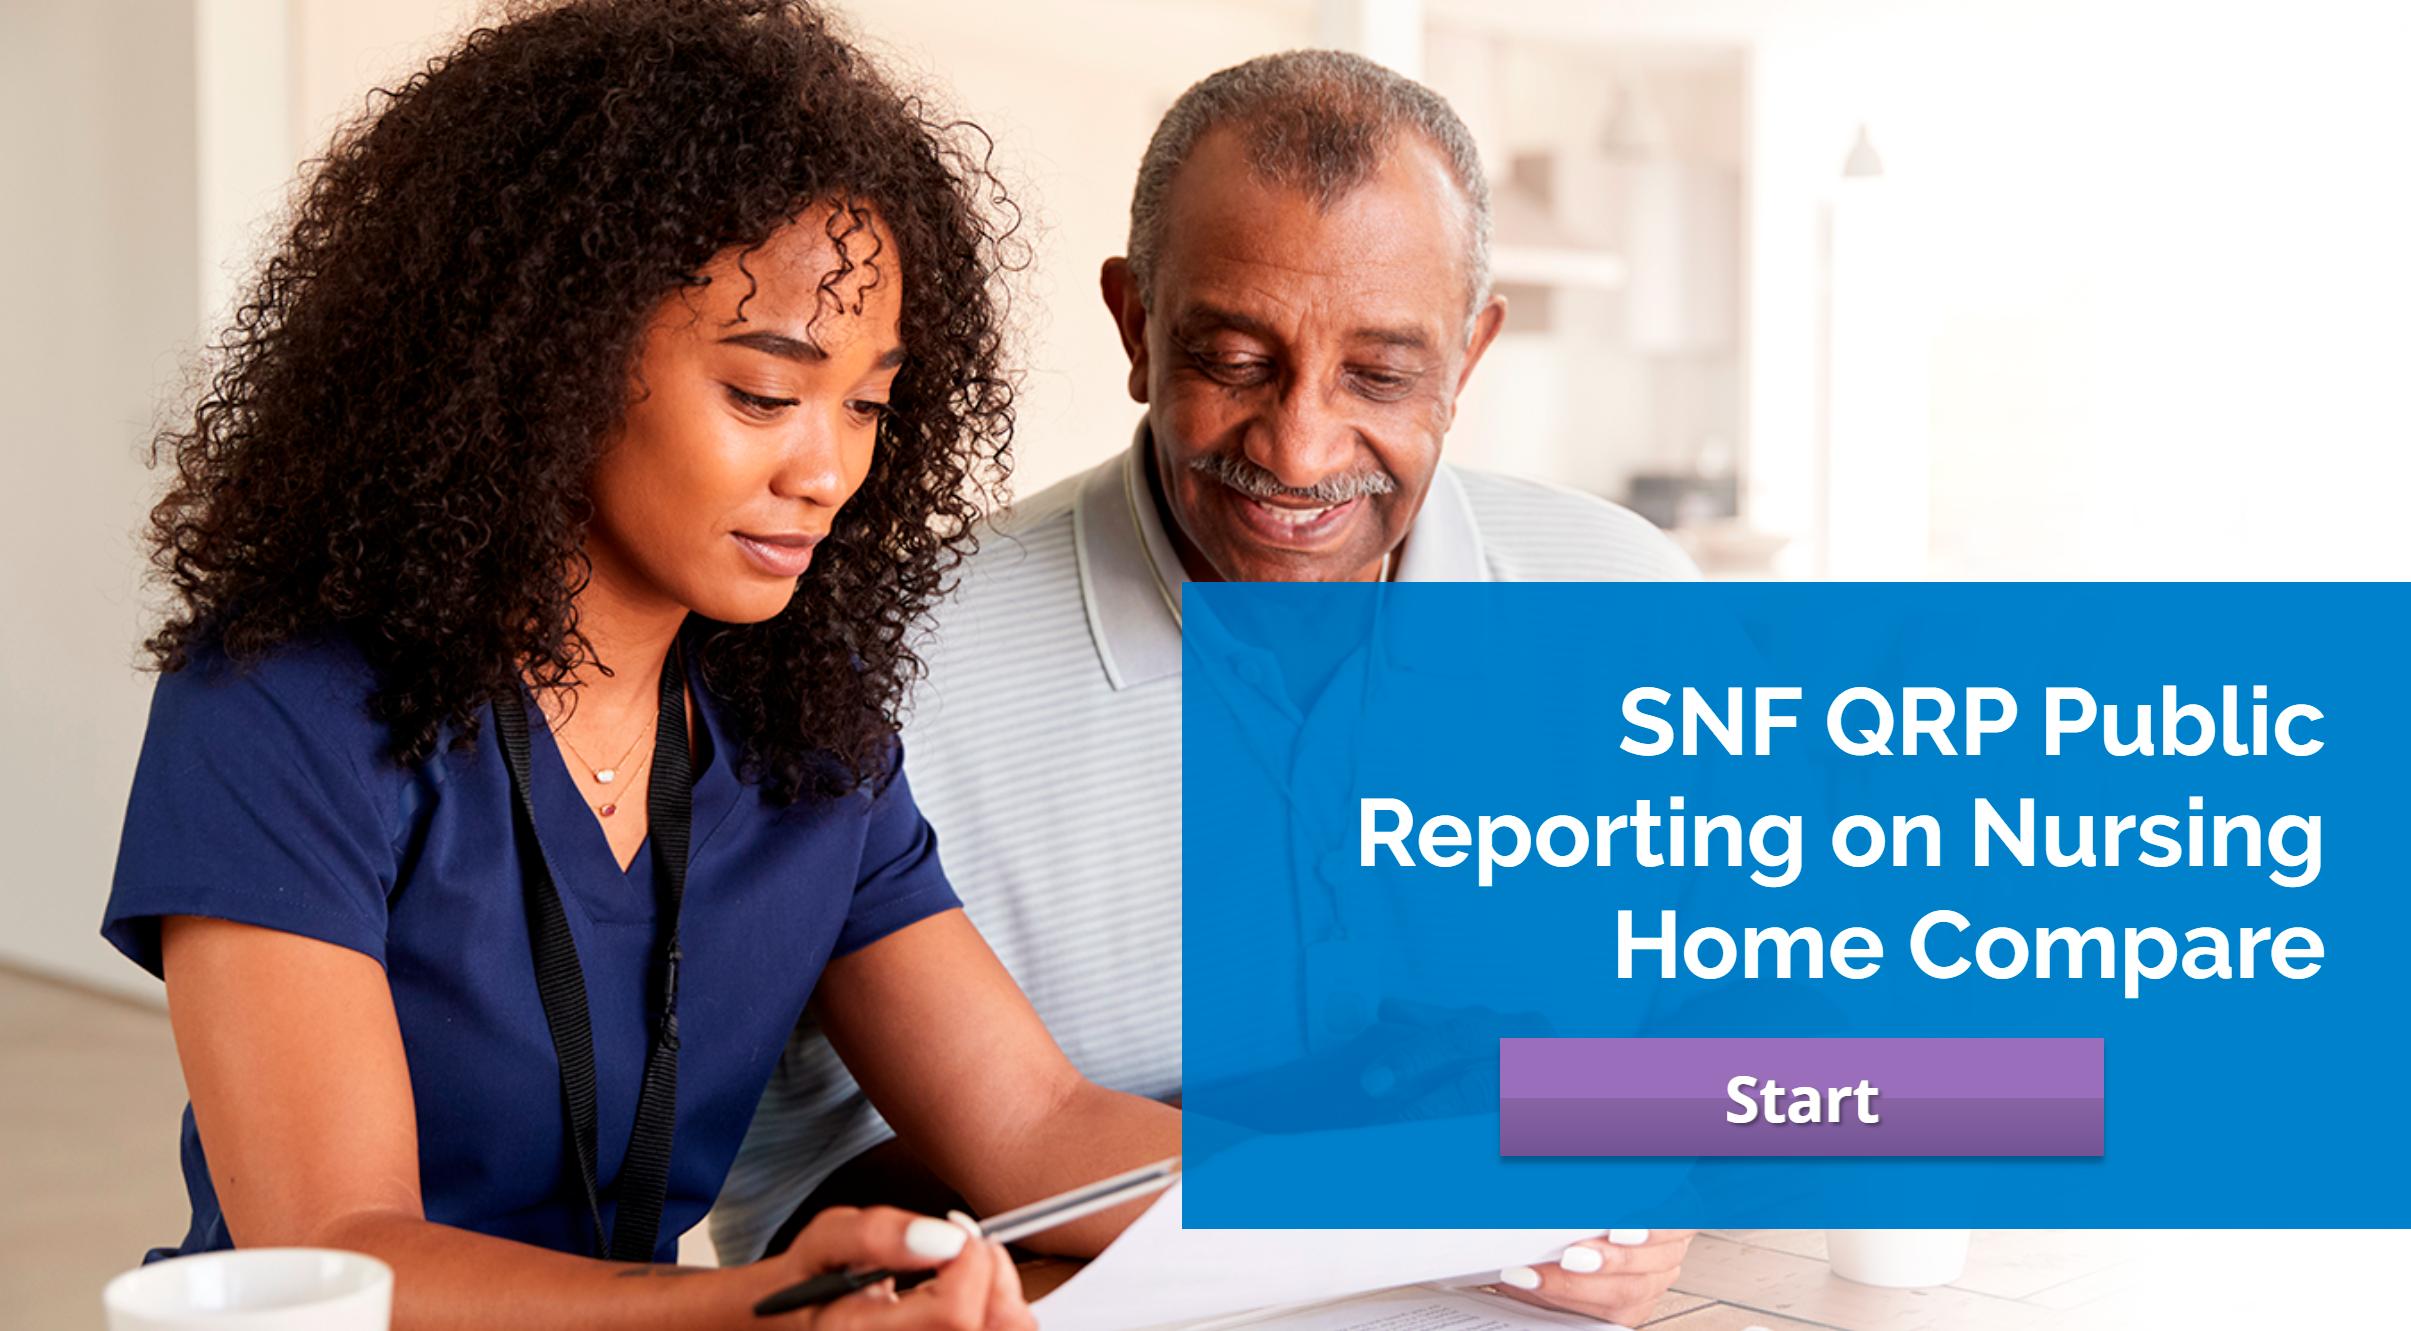 CMS SNF QRP: Nursing Home Public Reporting